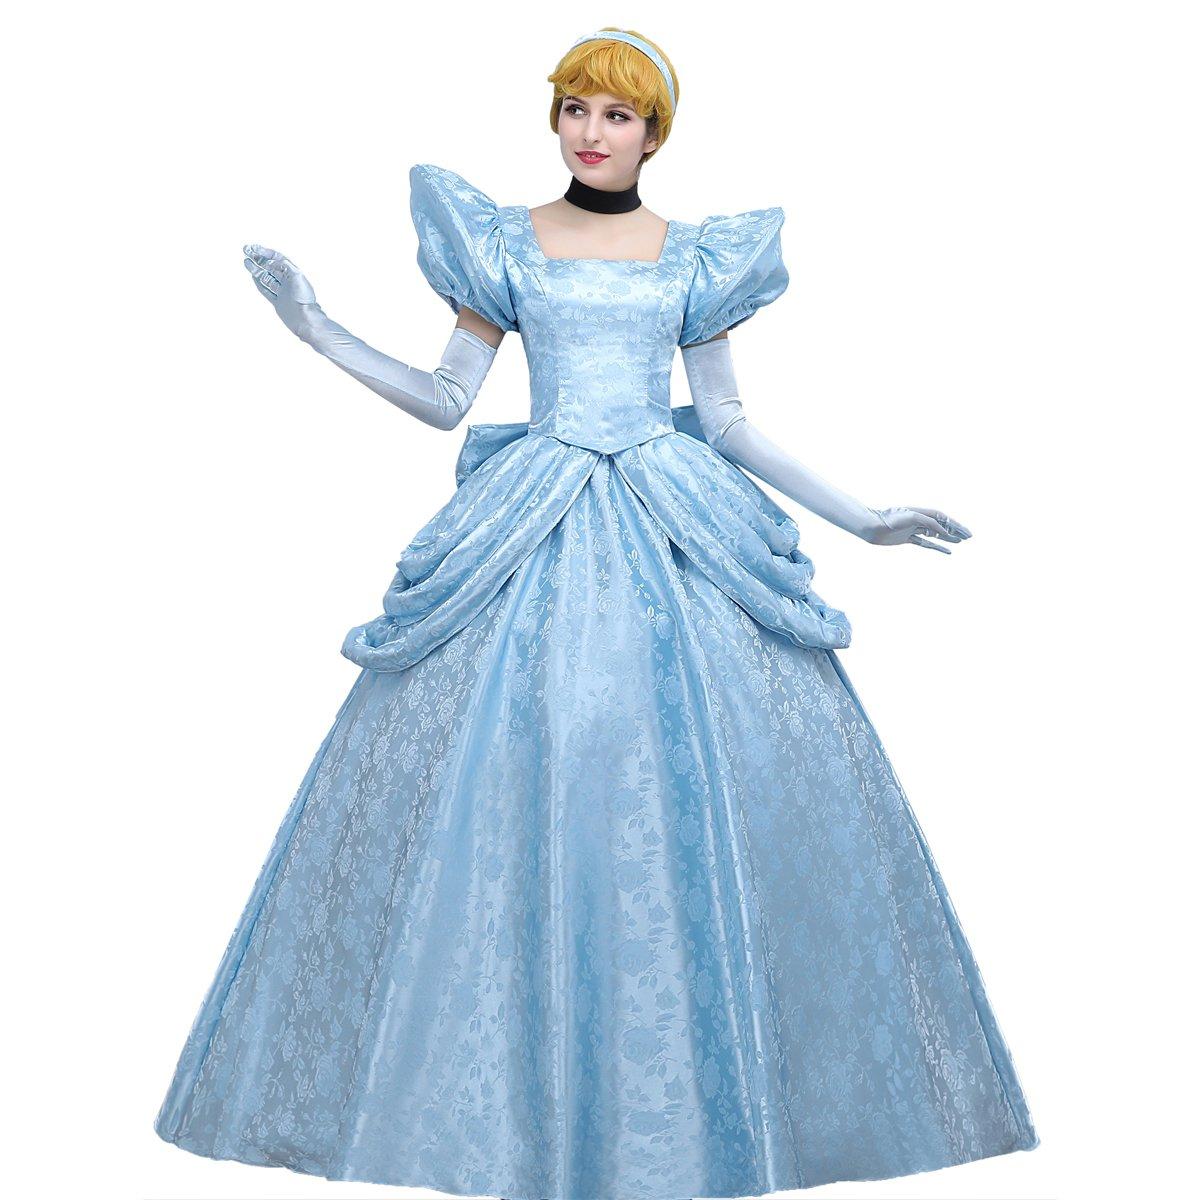 Angelaicos Women's Luxury Light Blue Party Long Dress Costume Ball Gown (L)